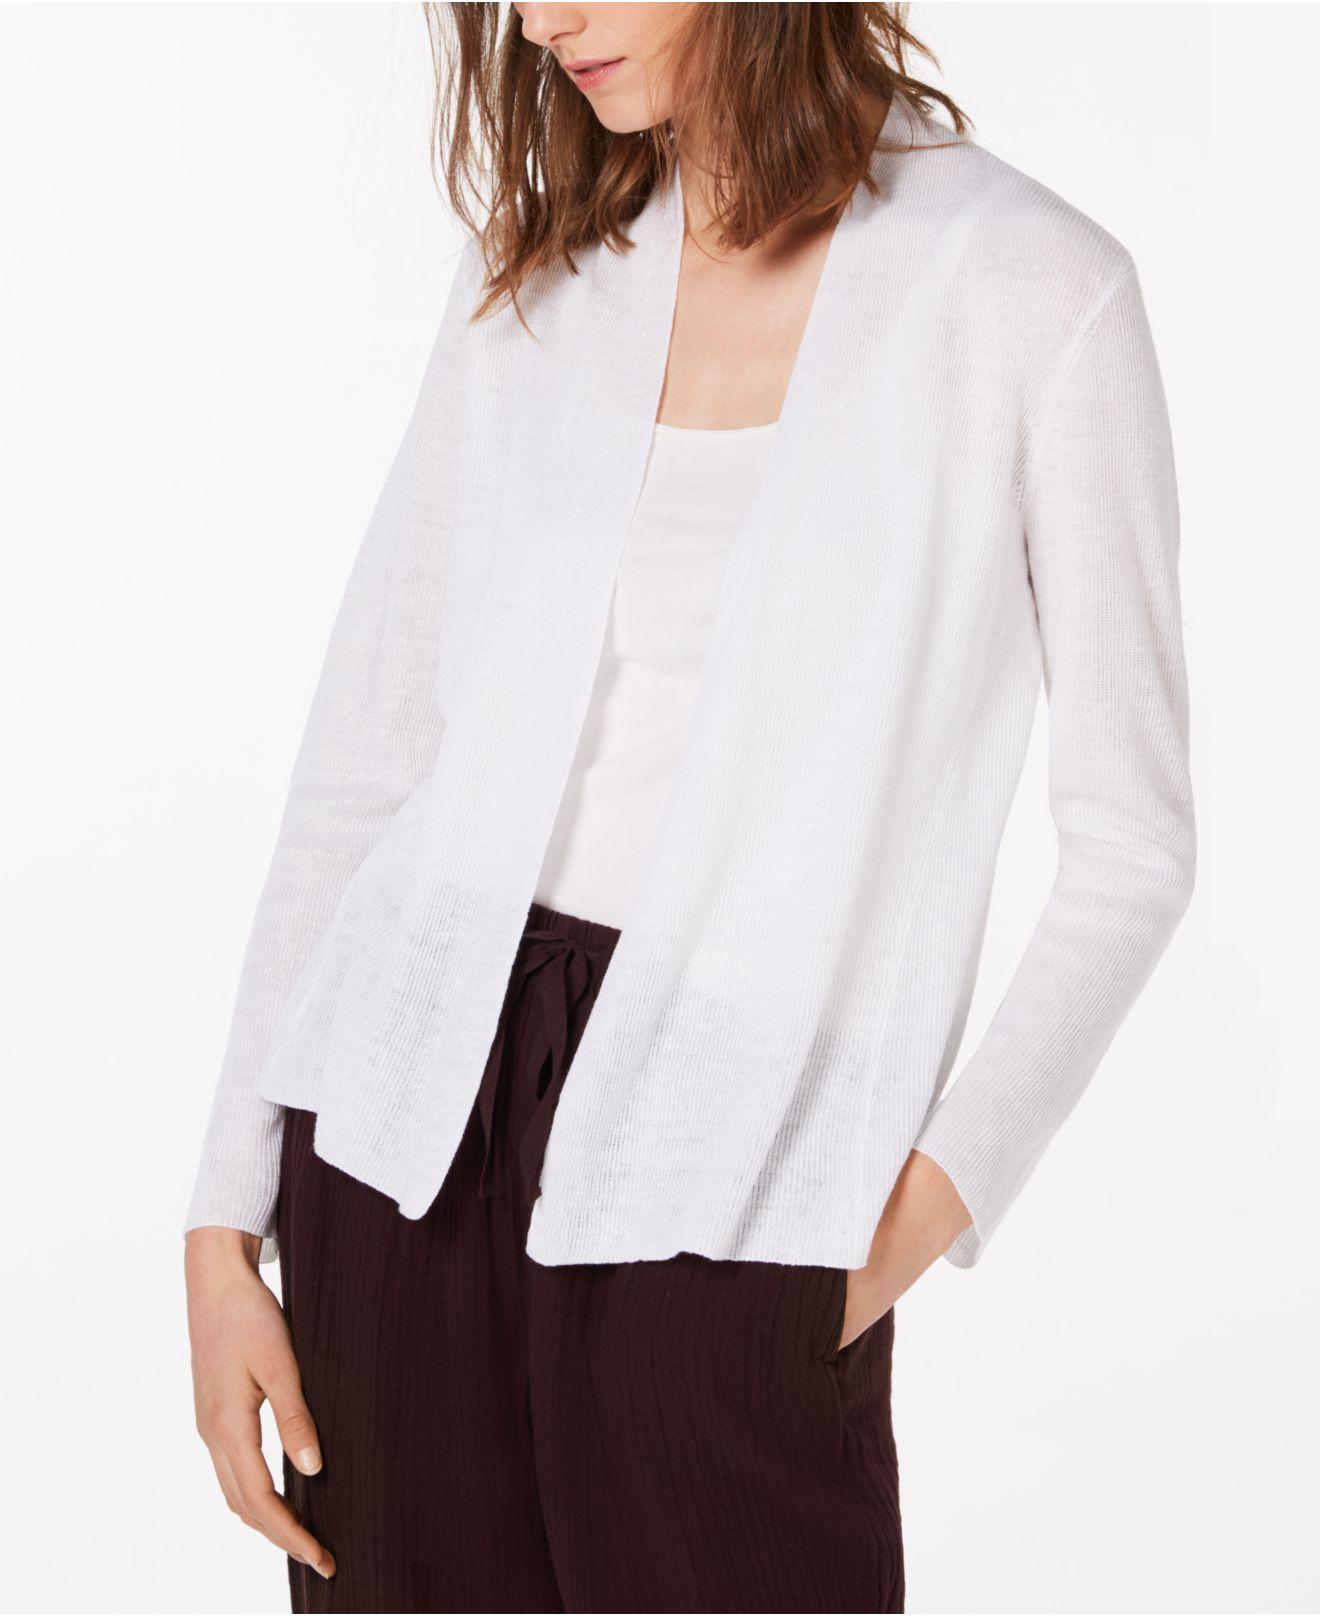 94fffb81052 Eileen Fisher. Women s White Organic Linen Open Cardigan ...